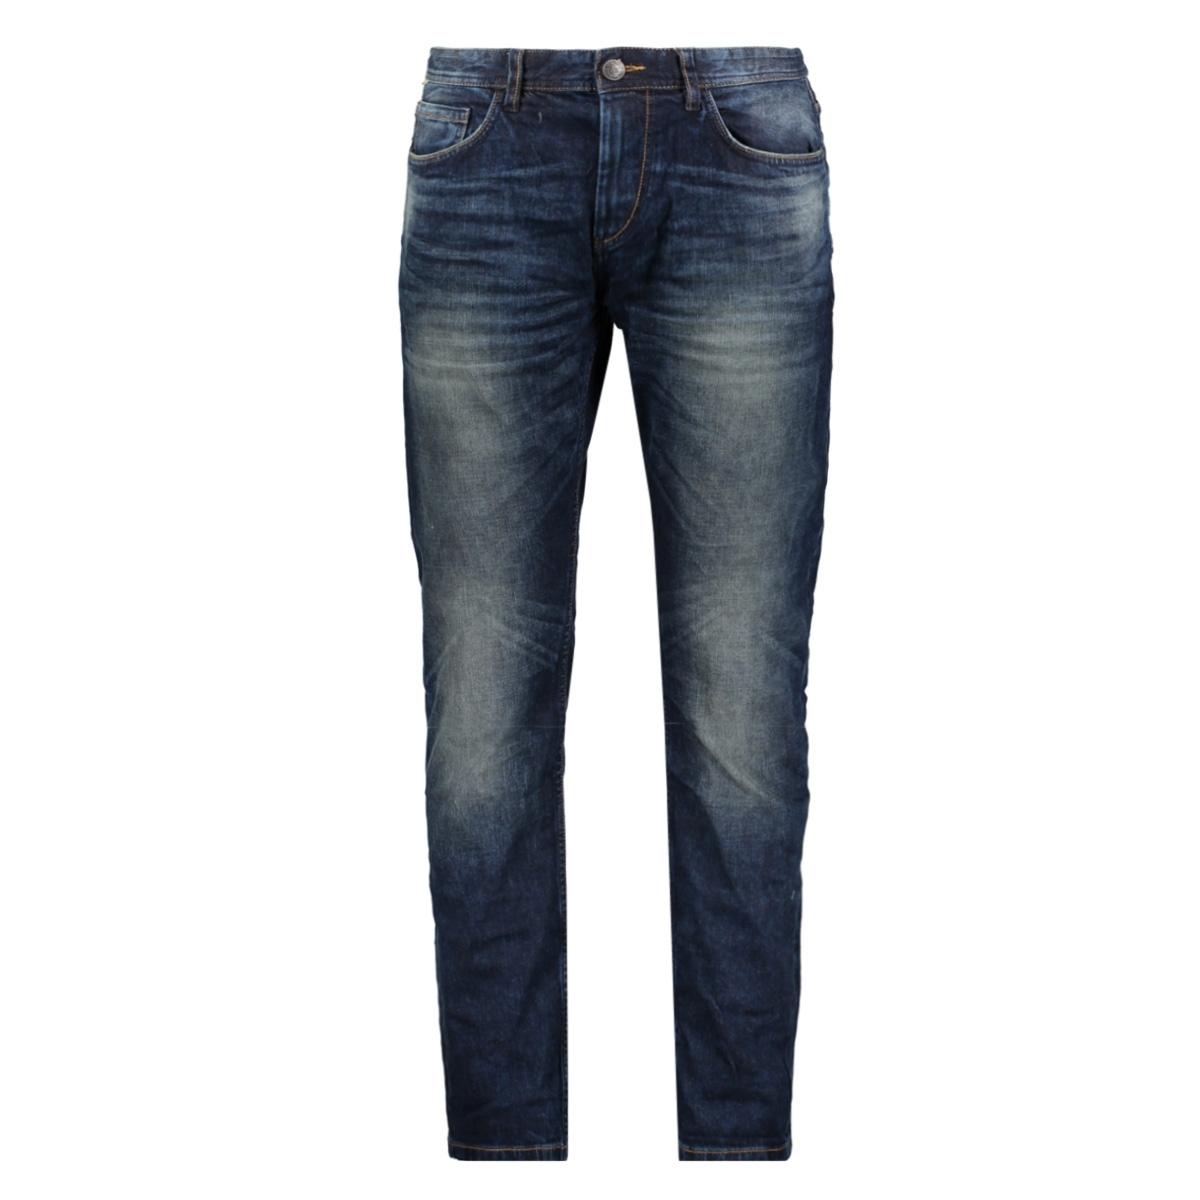 6255162.00.10 tom tailor jeans 1053